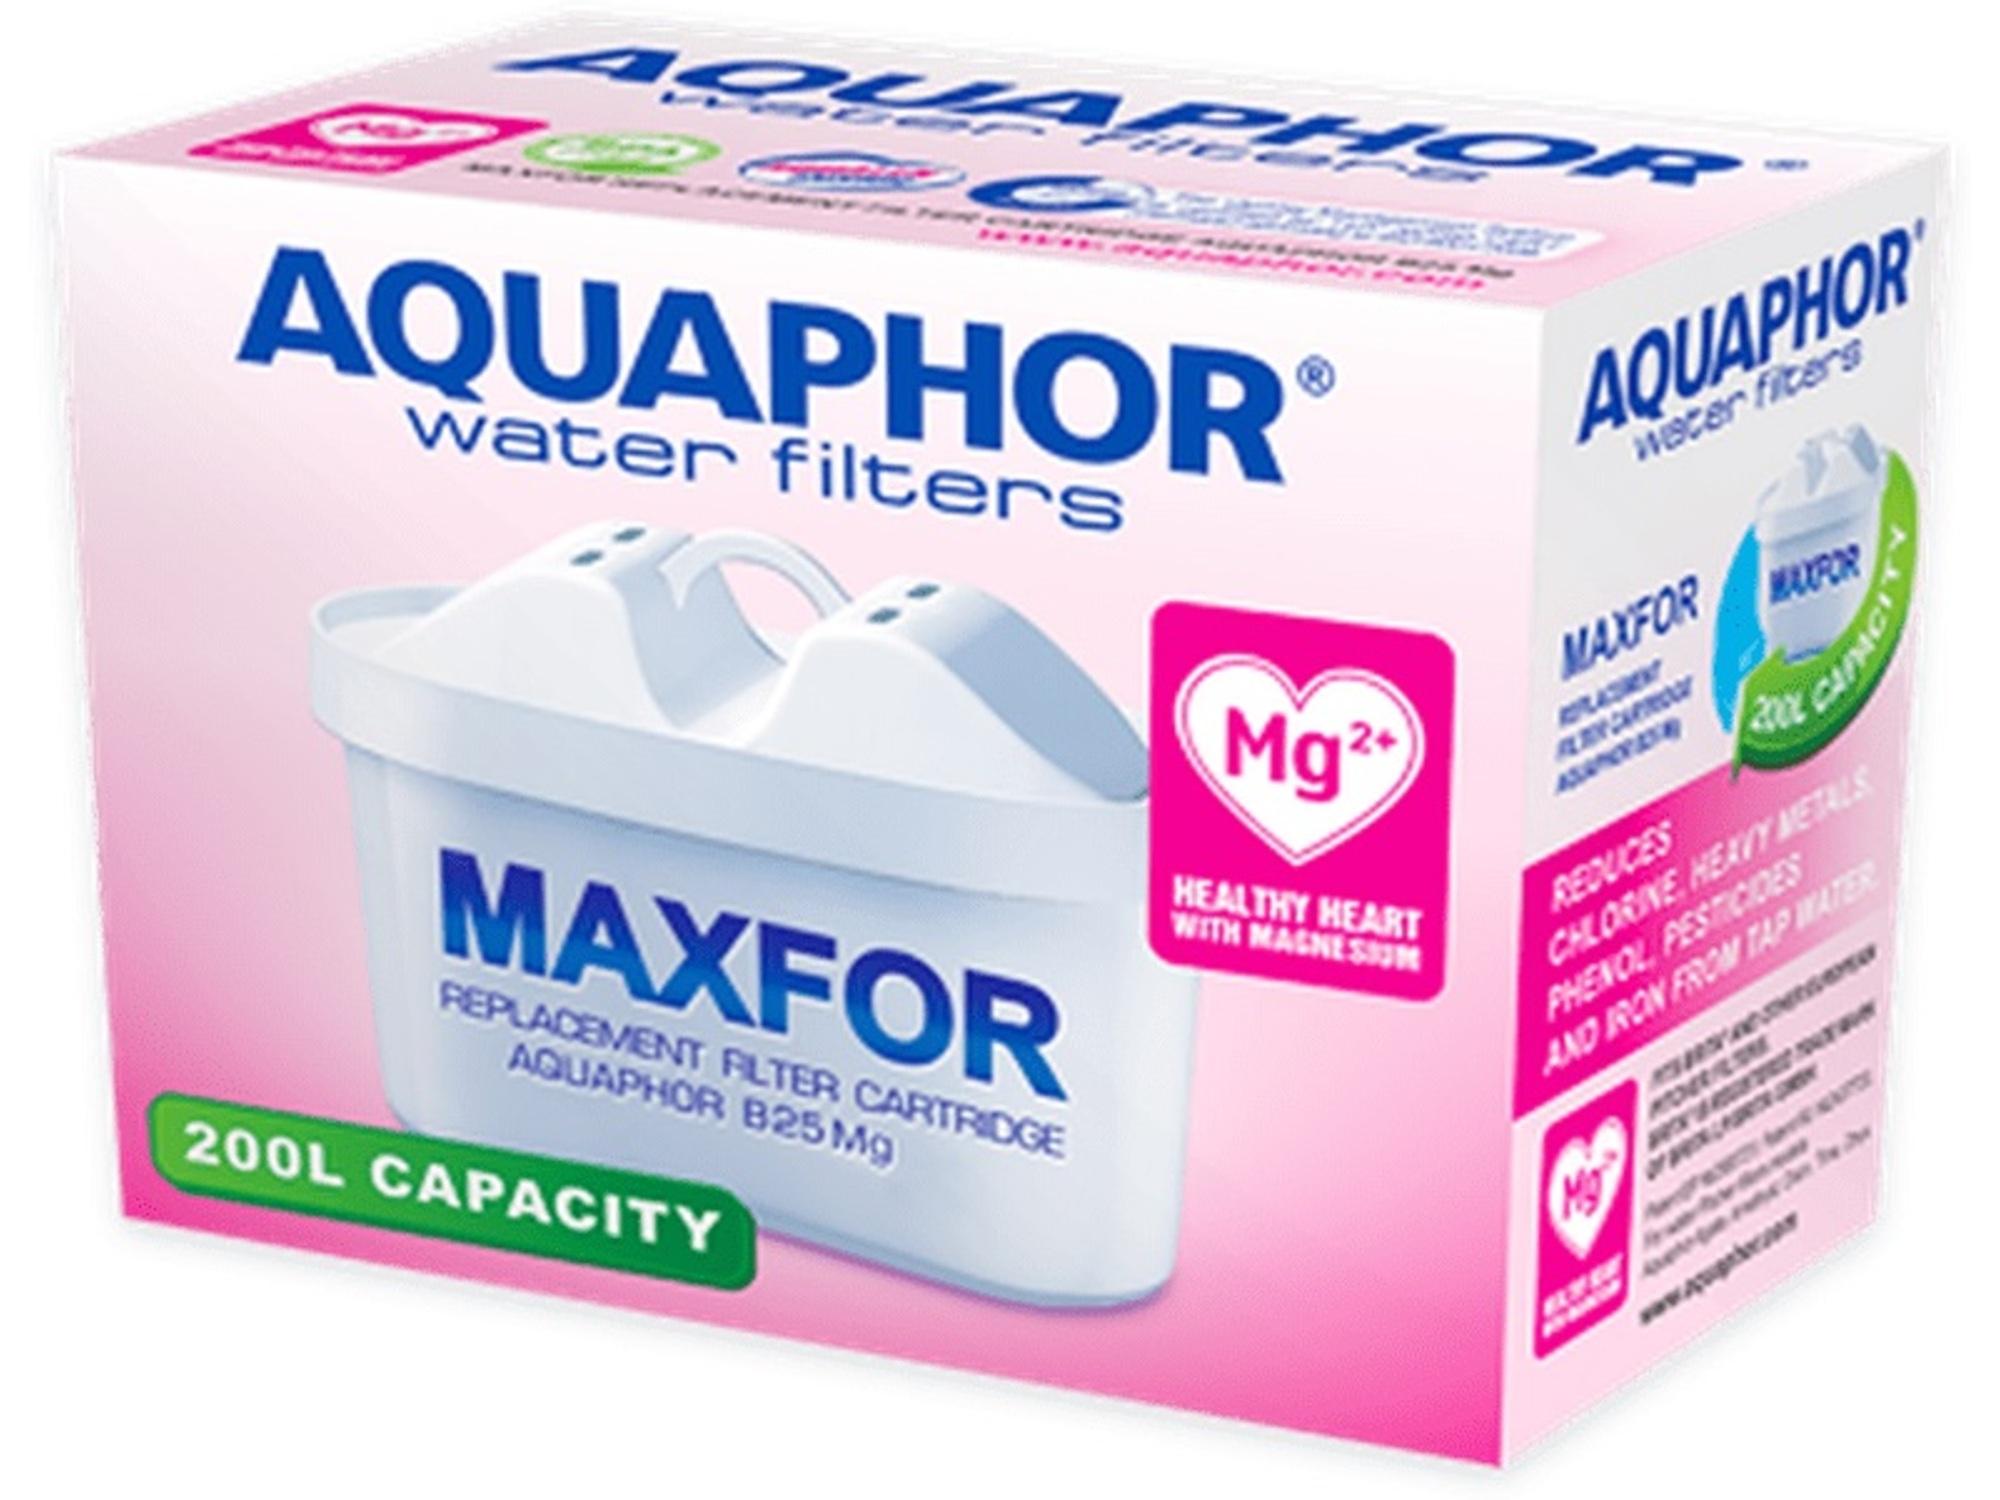 Aquaphor Uložak Akvafor B25 Mg 202